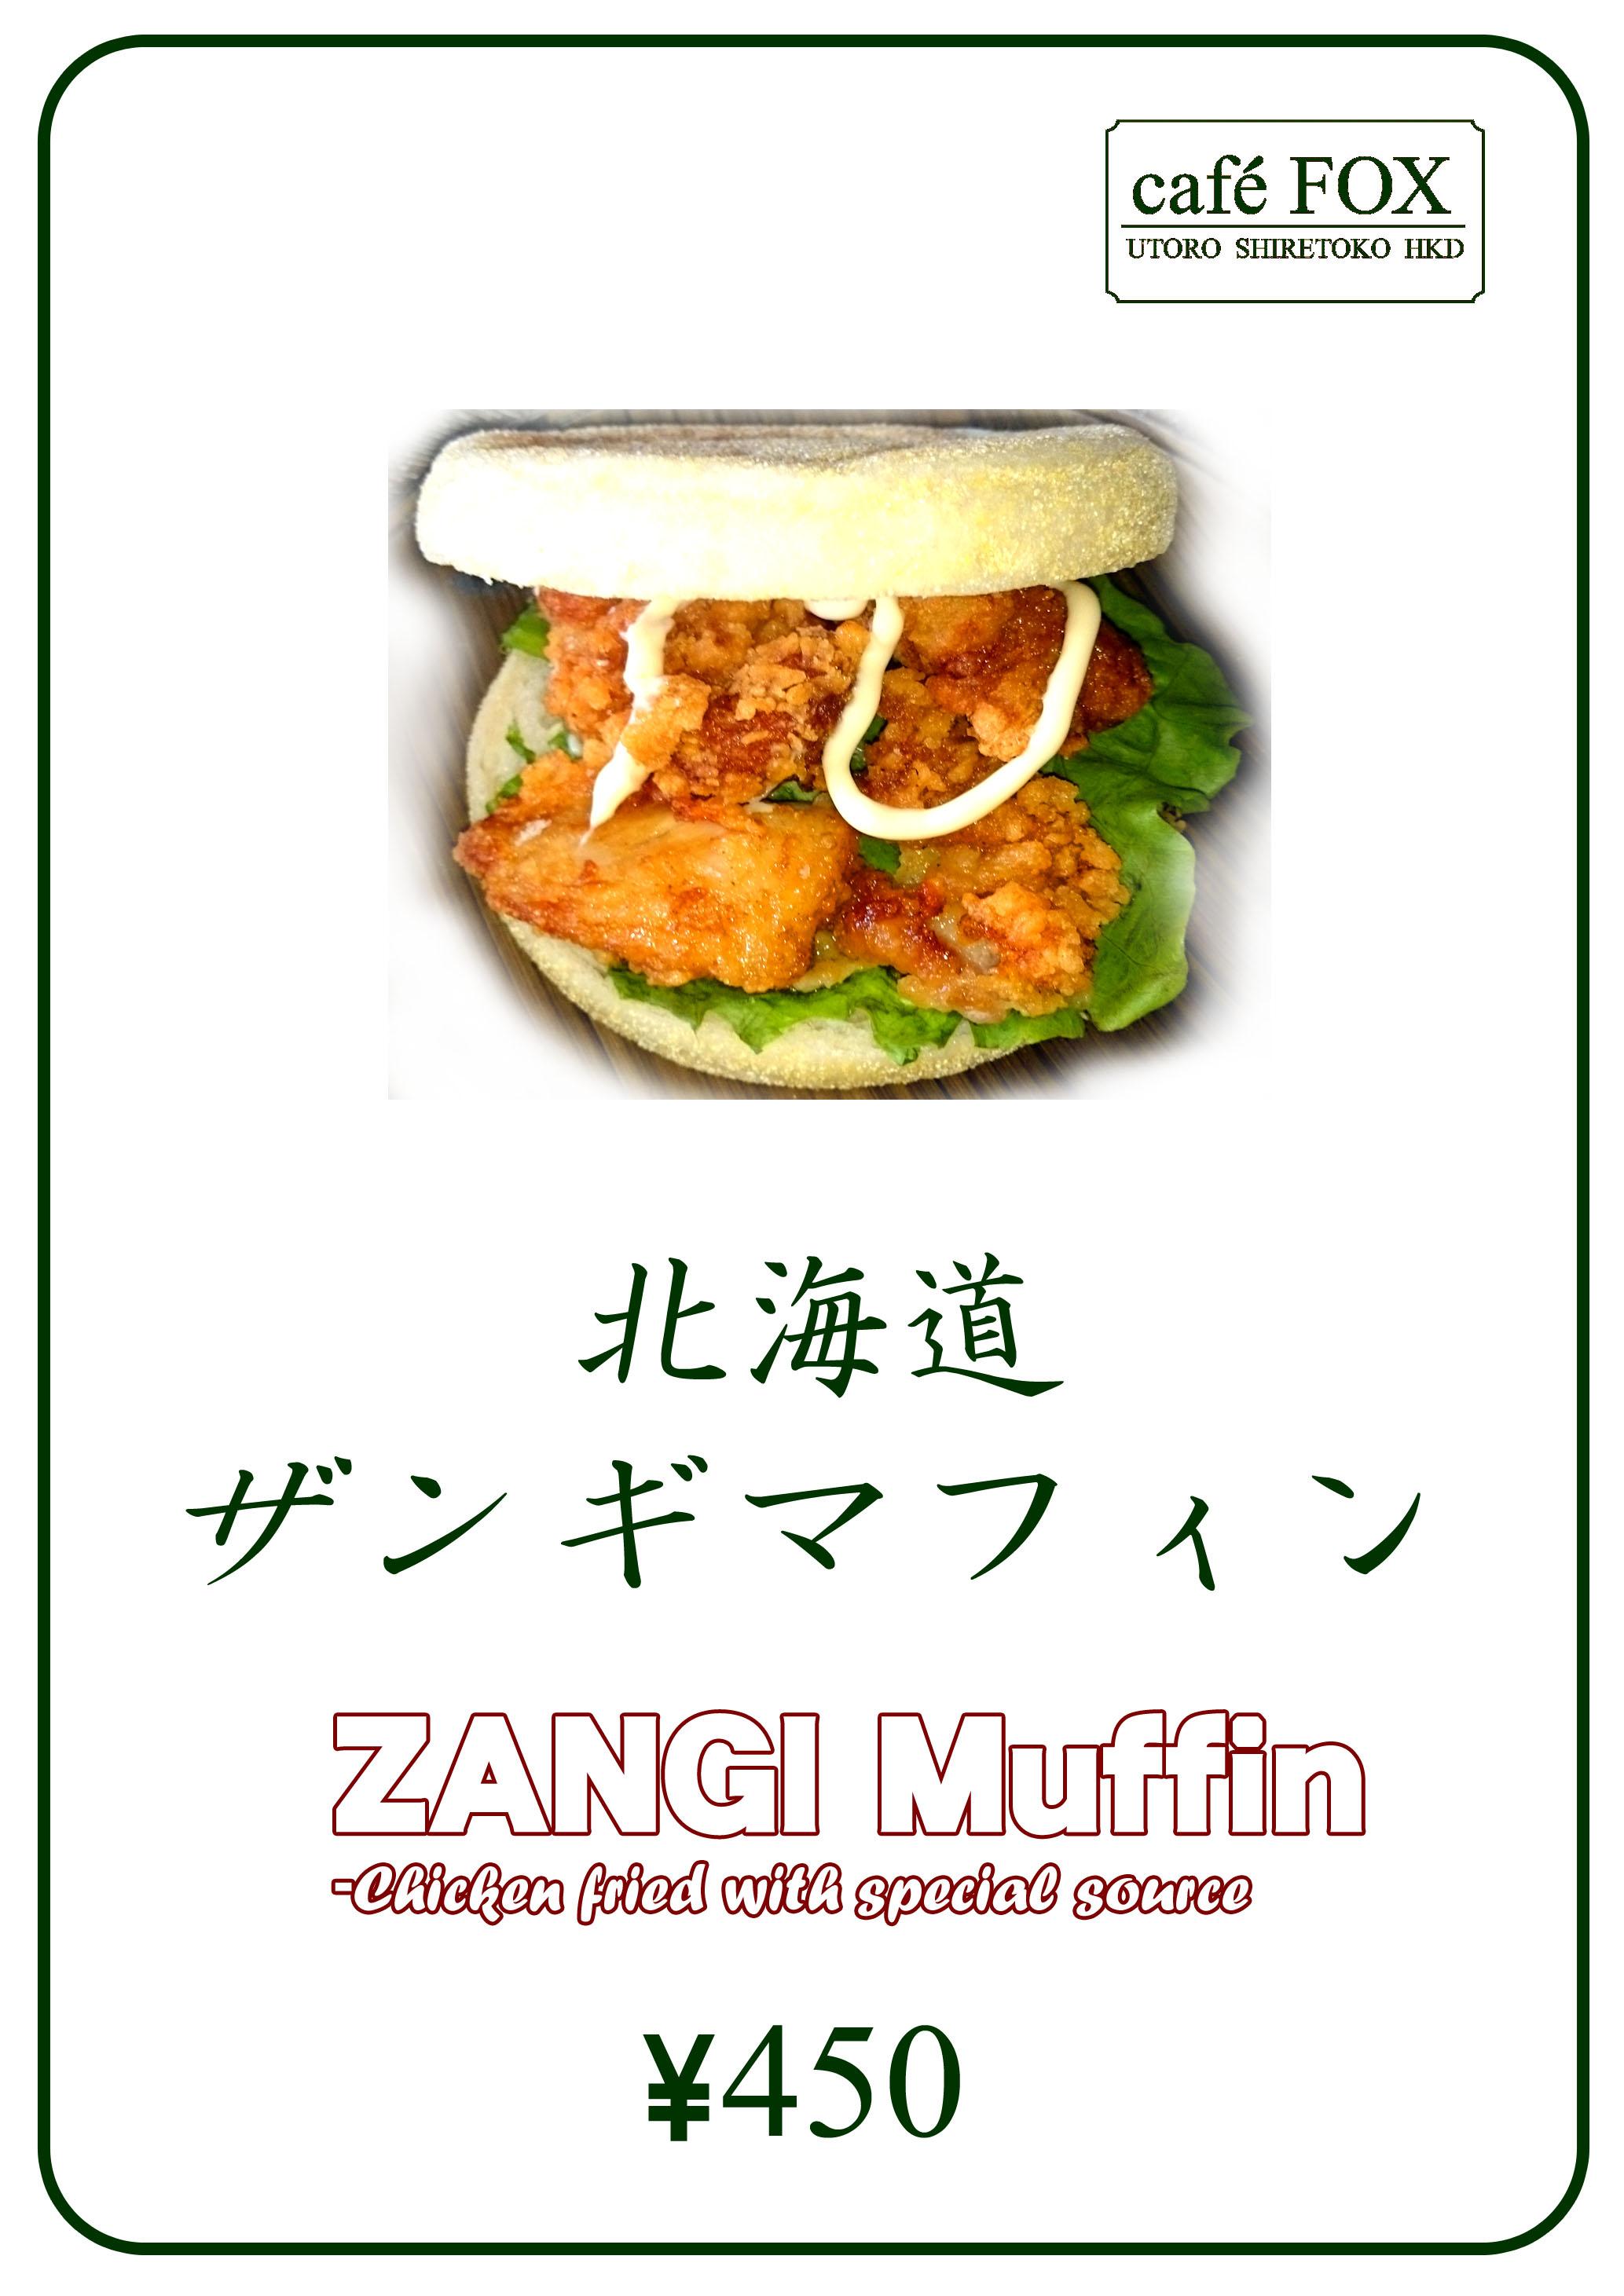 Zangi muffin - Shiretoko, Hokkaido